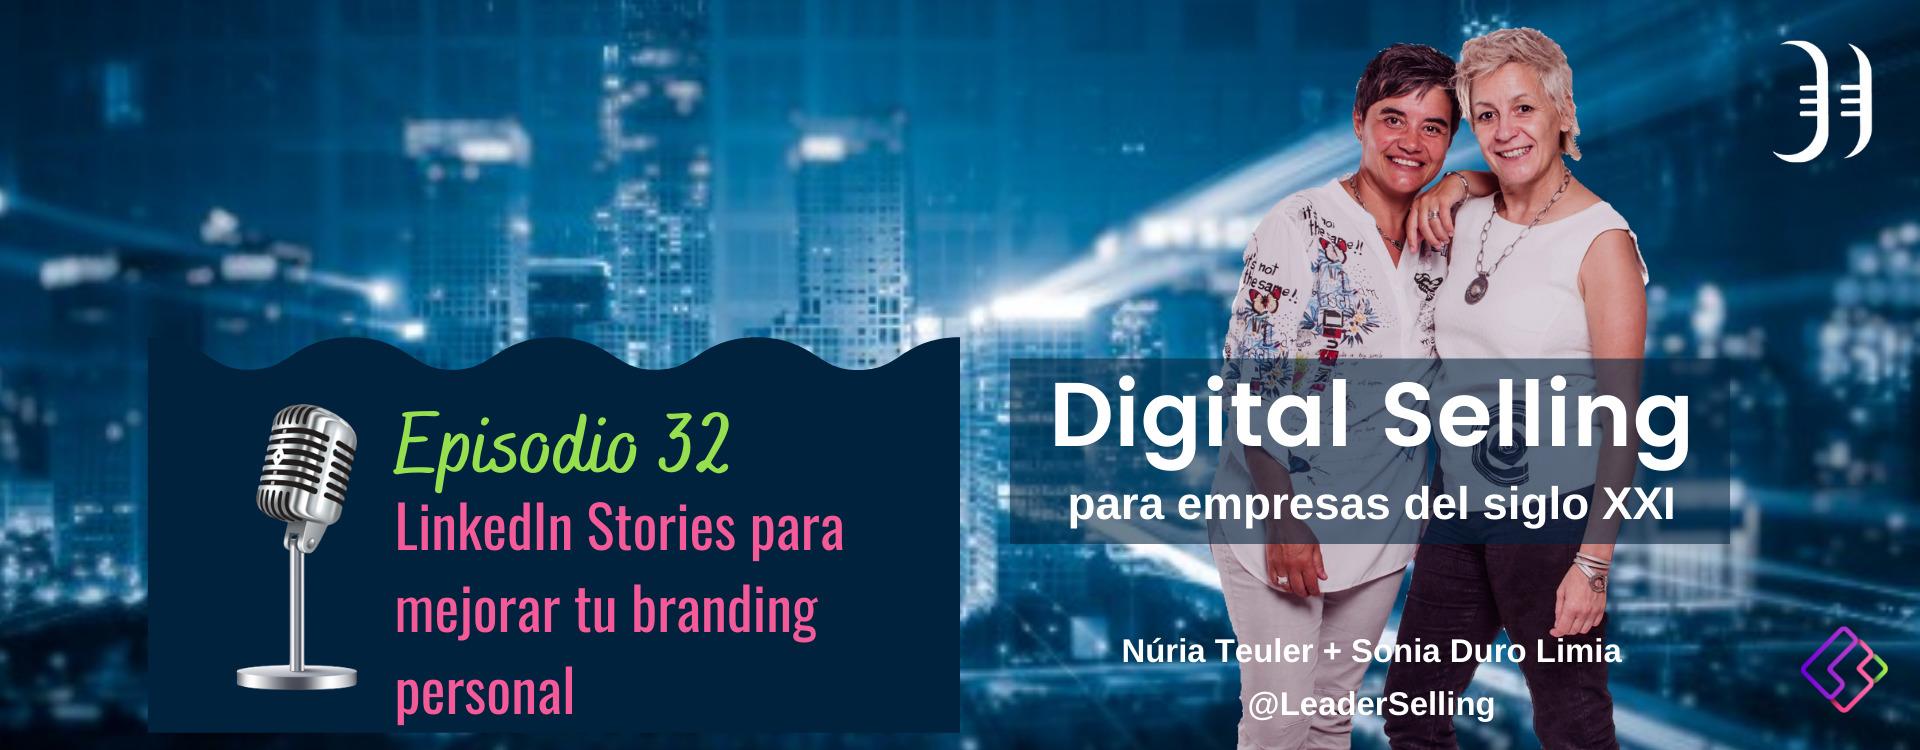 Episodio 32. LinkedIn Stories para mejorar tu branding